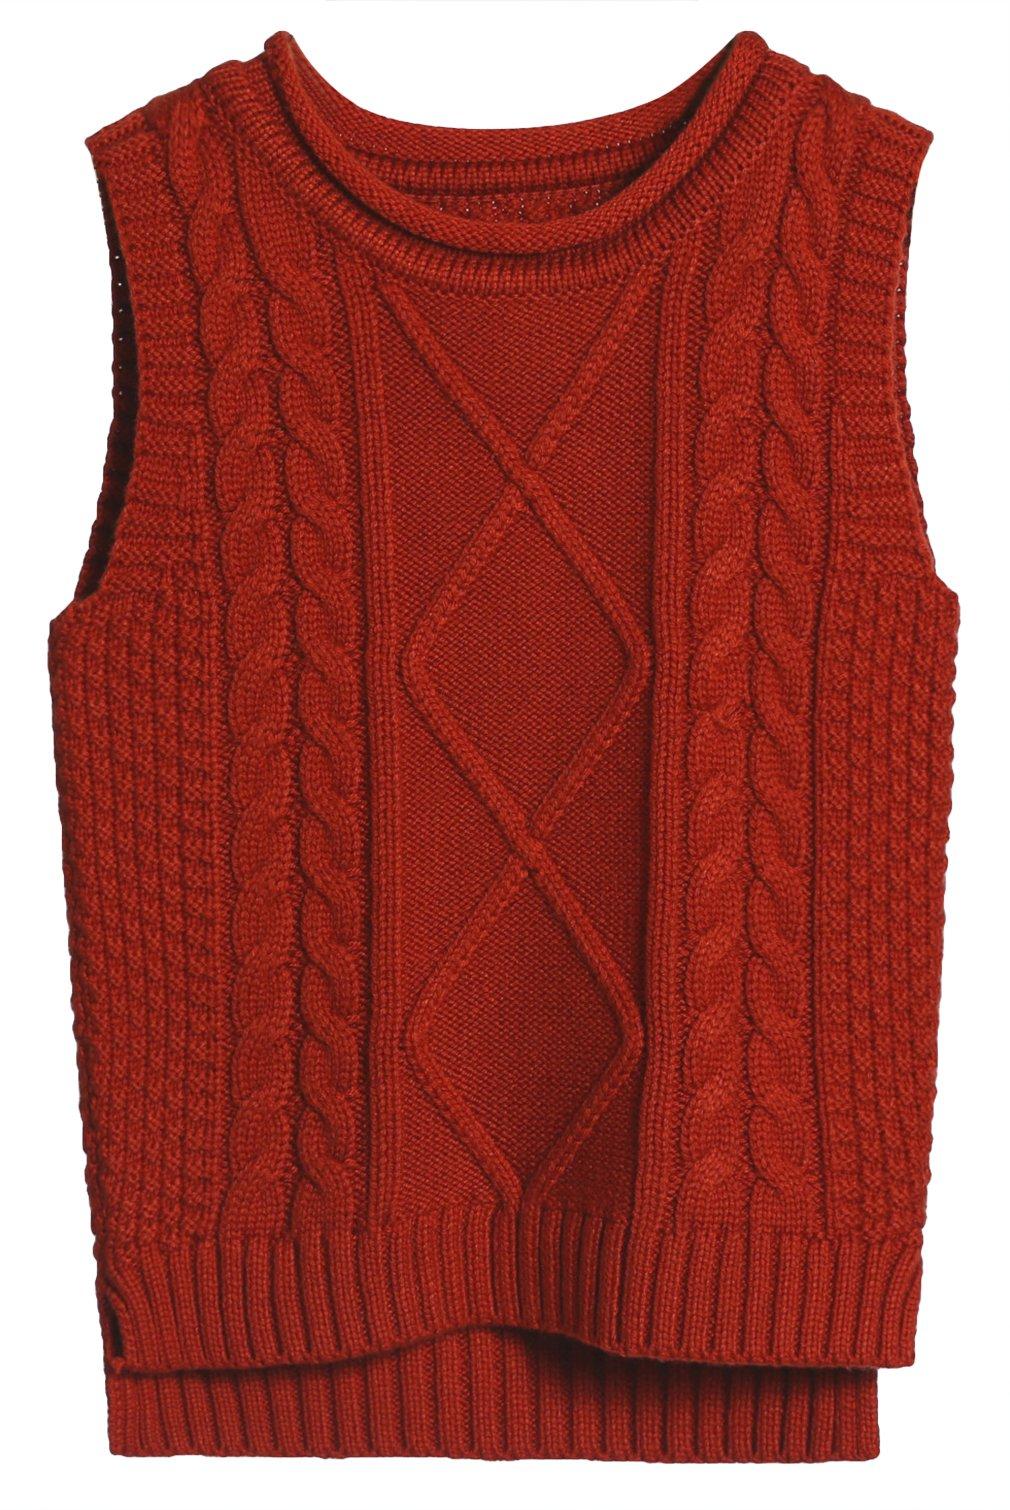 La Vogue Boys Girls Vest Knit Sweater Kid Uniform Waistcoat Cable Knit Pullover Orange 130